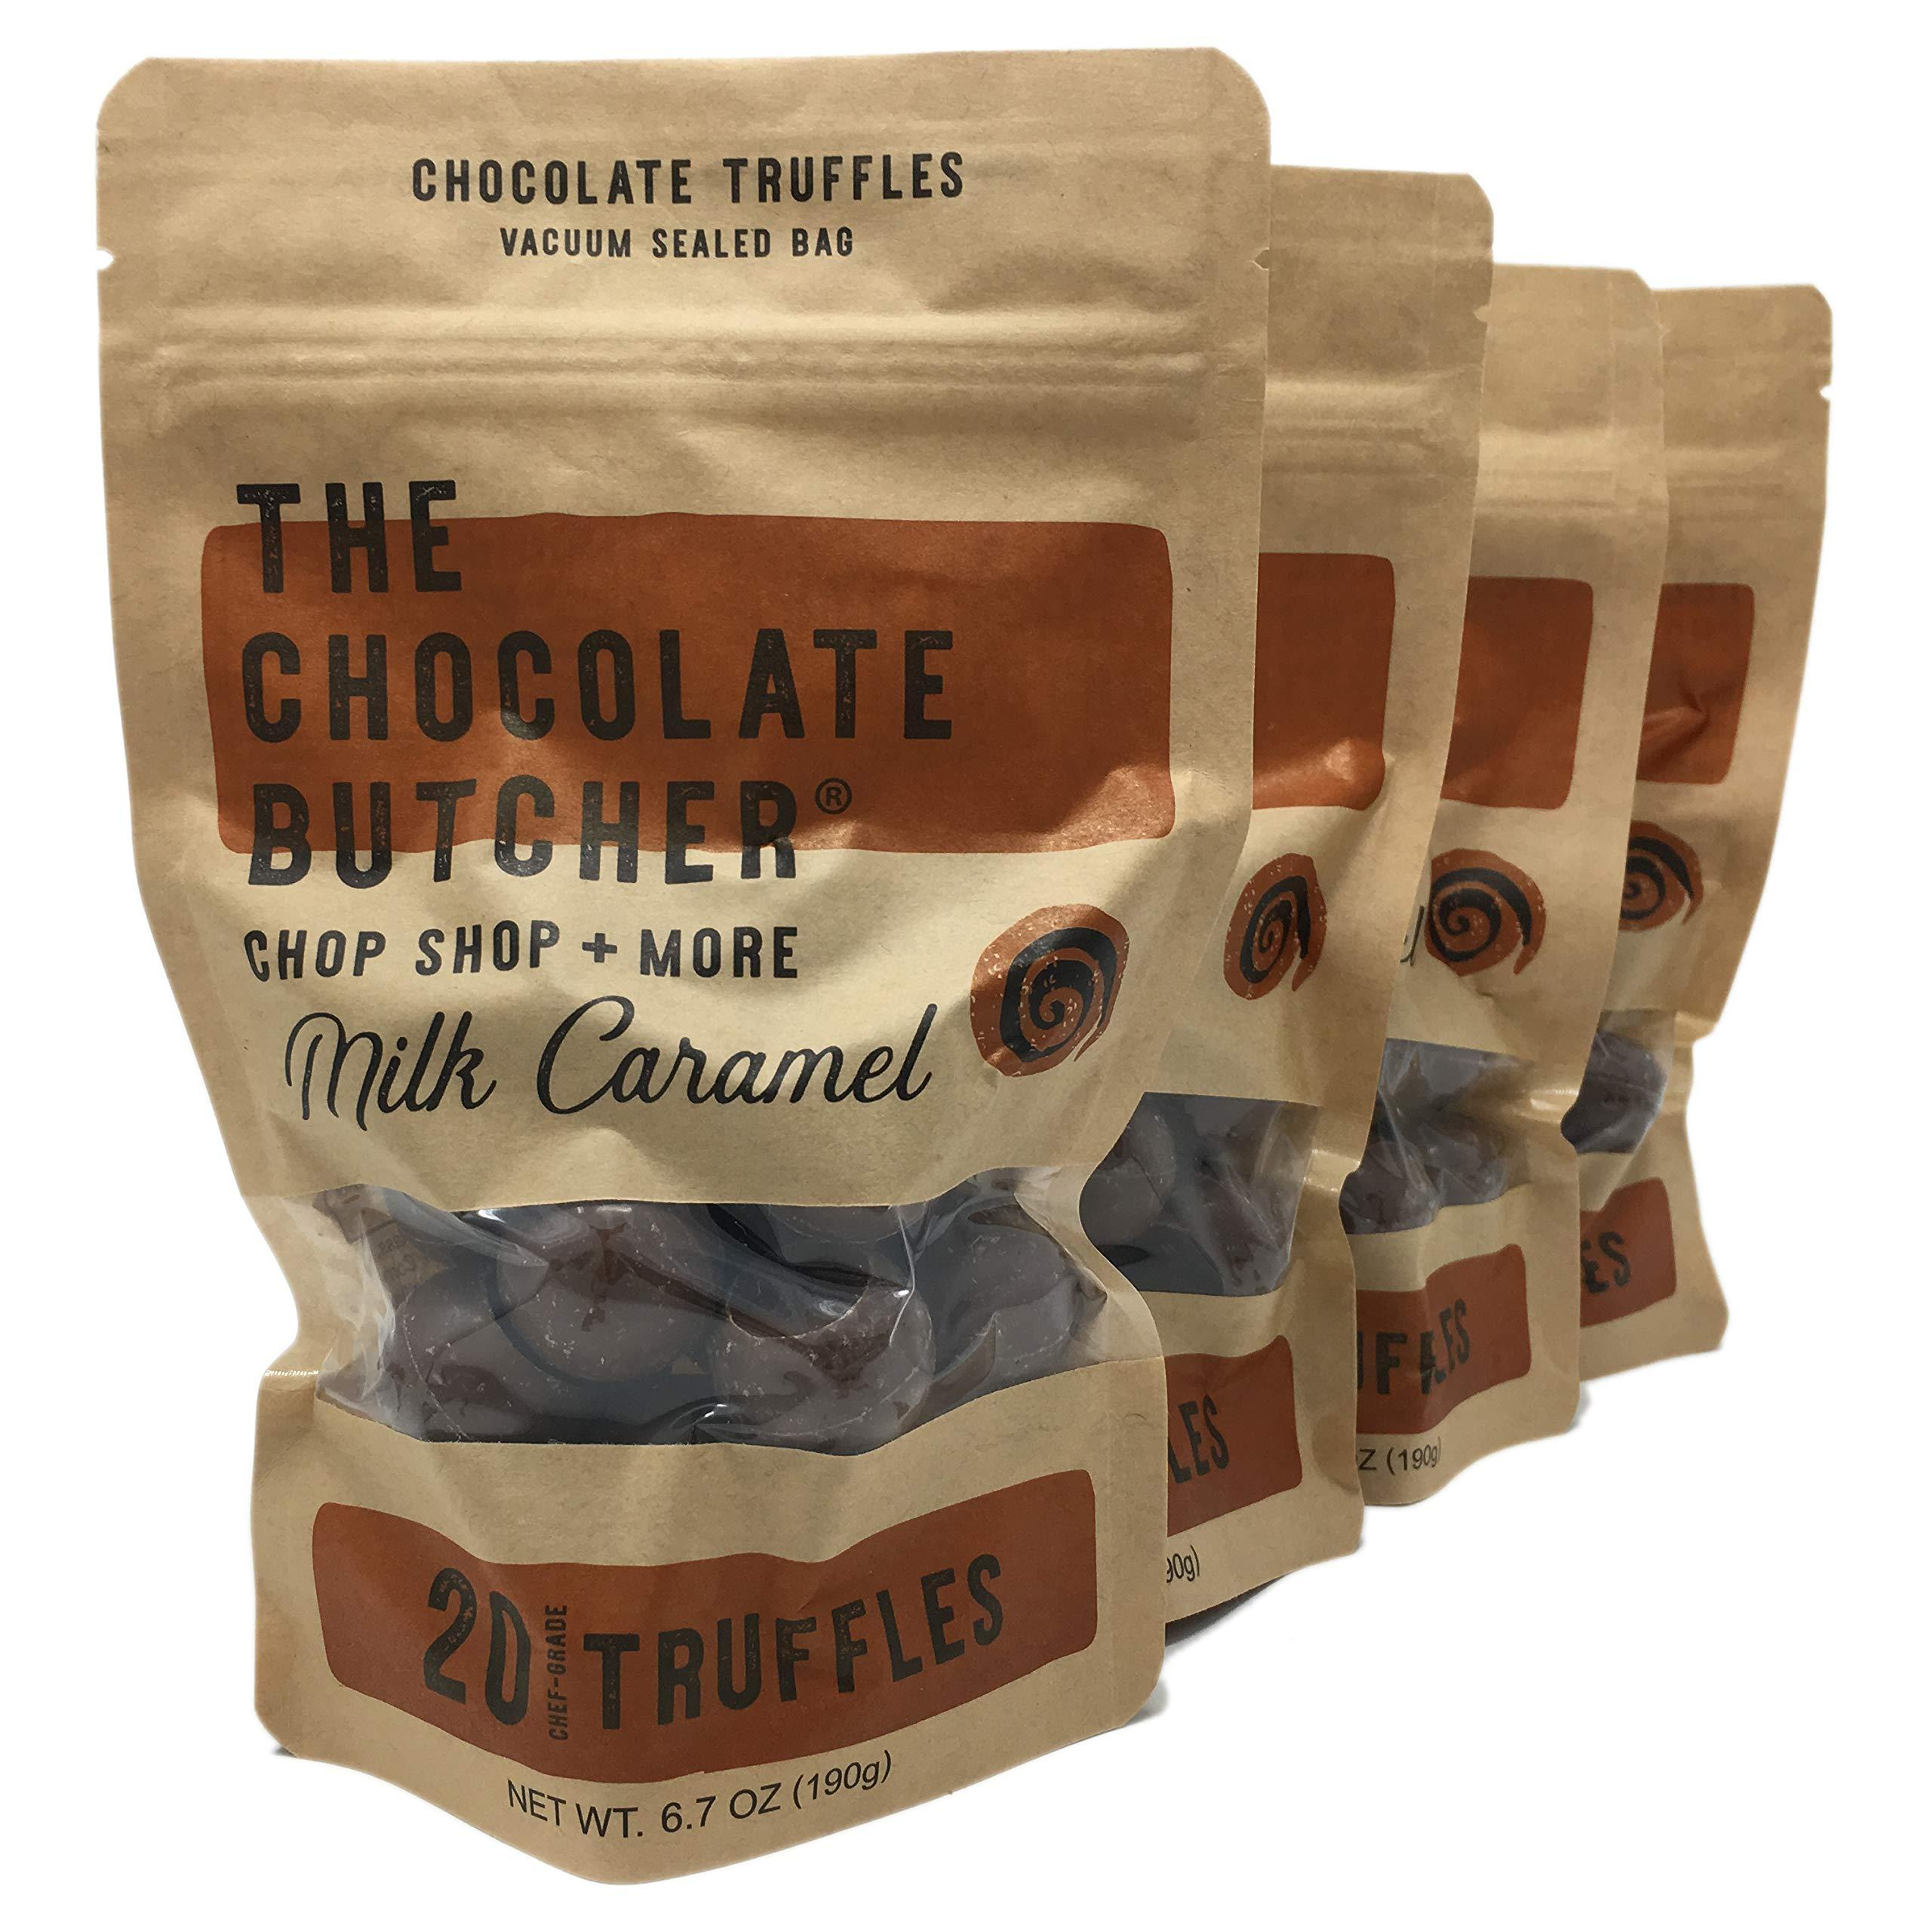 Chef-Grade Caramel Milk Chocolate Truffles (Four Bags-80 Truffles) by The Chocolate Butcher